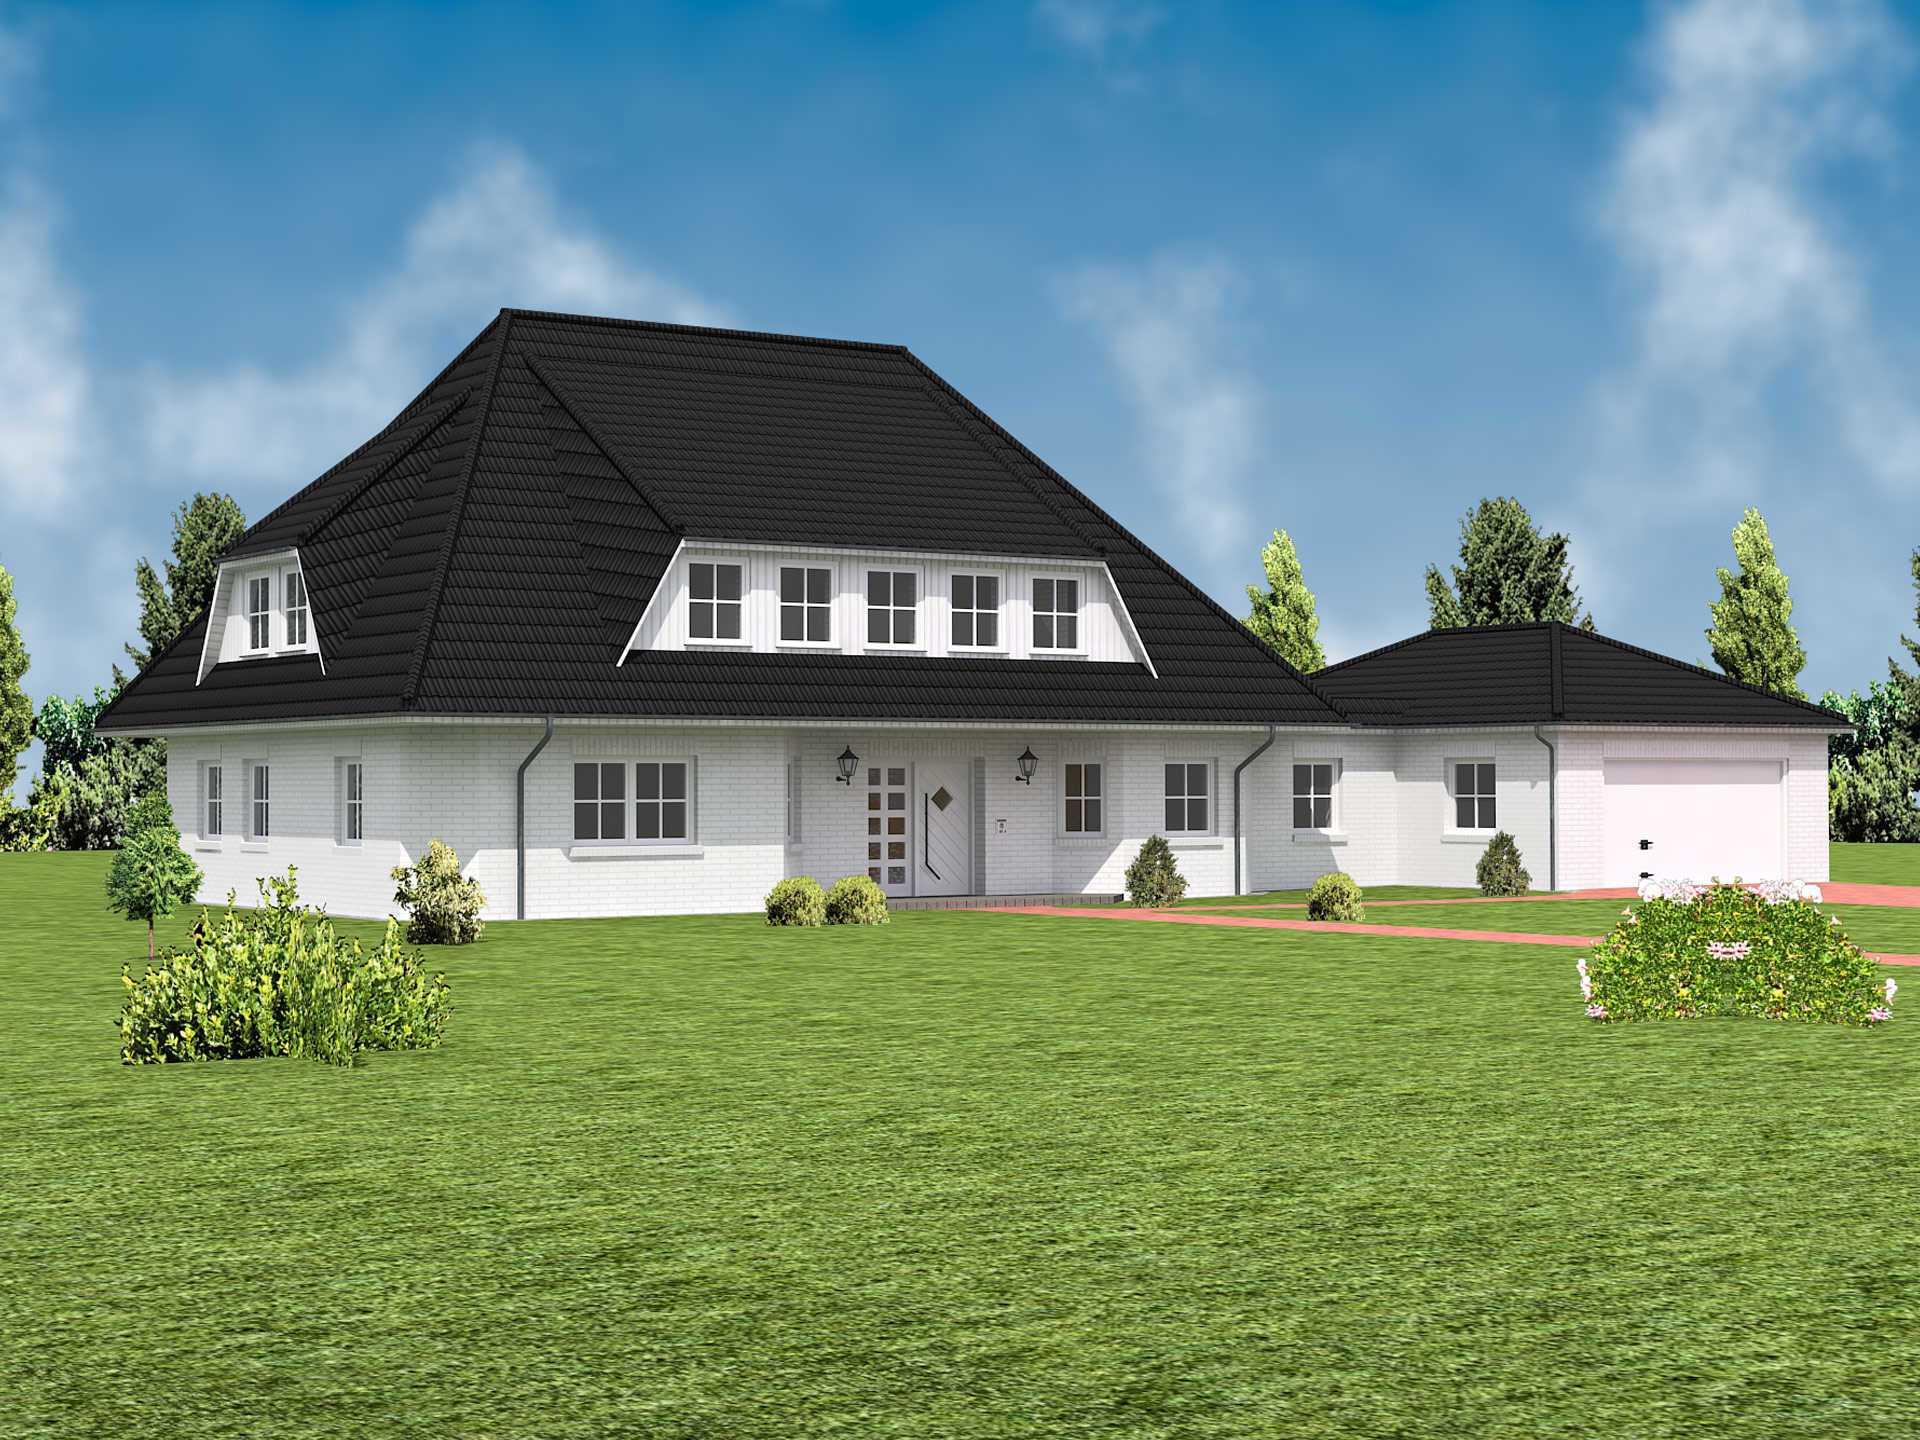 Villa Blankenese  Ibis Haus  Musterhausnet